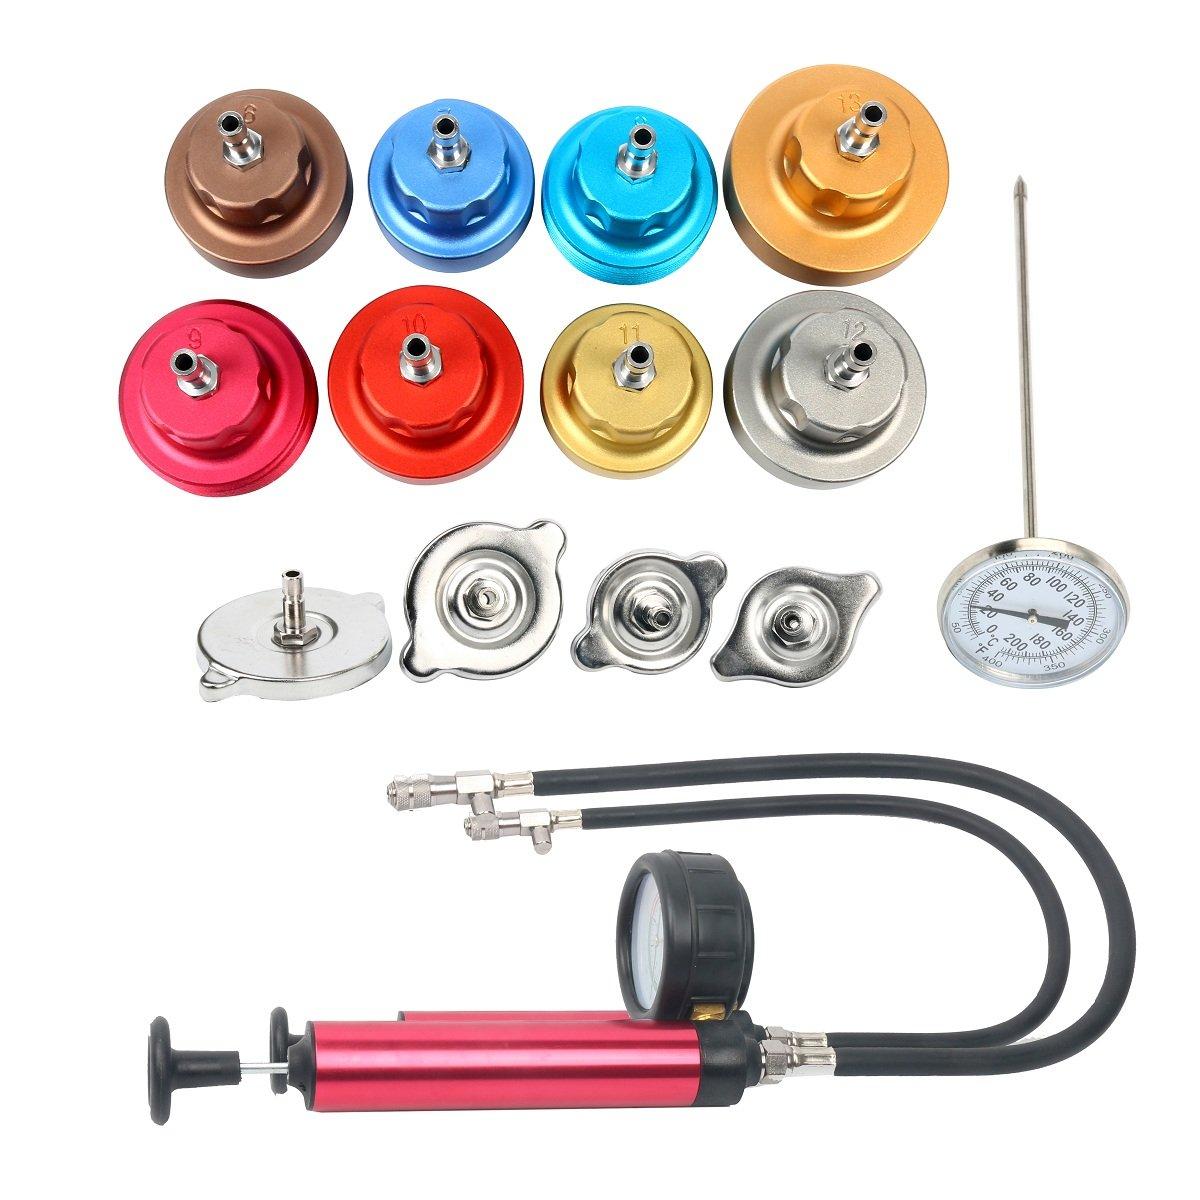 8MILELAKE 14 PCs Pressure Cooling System car Leak Tester Kit Detector Tool Auto Coolant Vacuum Purge Head Gasket Water Tank Adapter Universal Automotive by 8MILELAKE (Image #2)